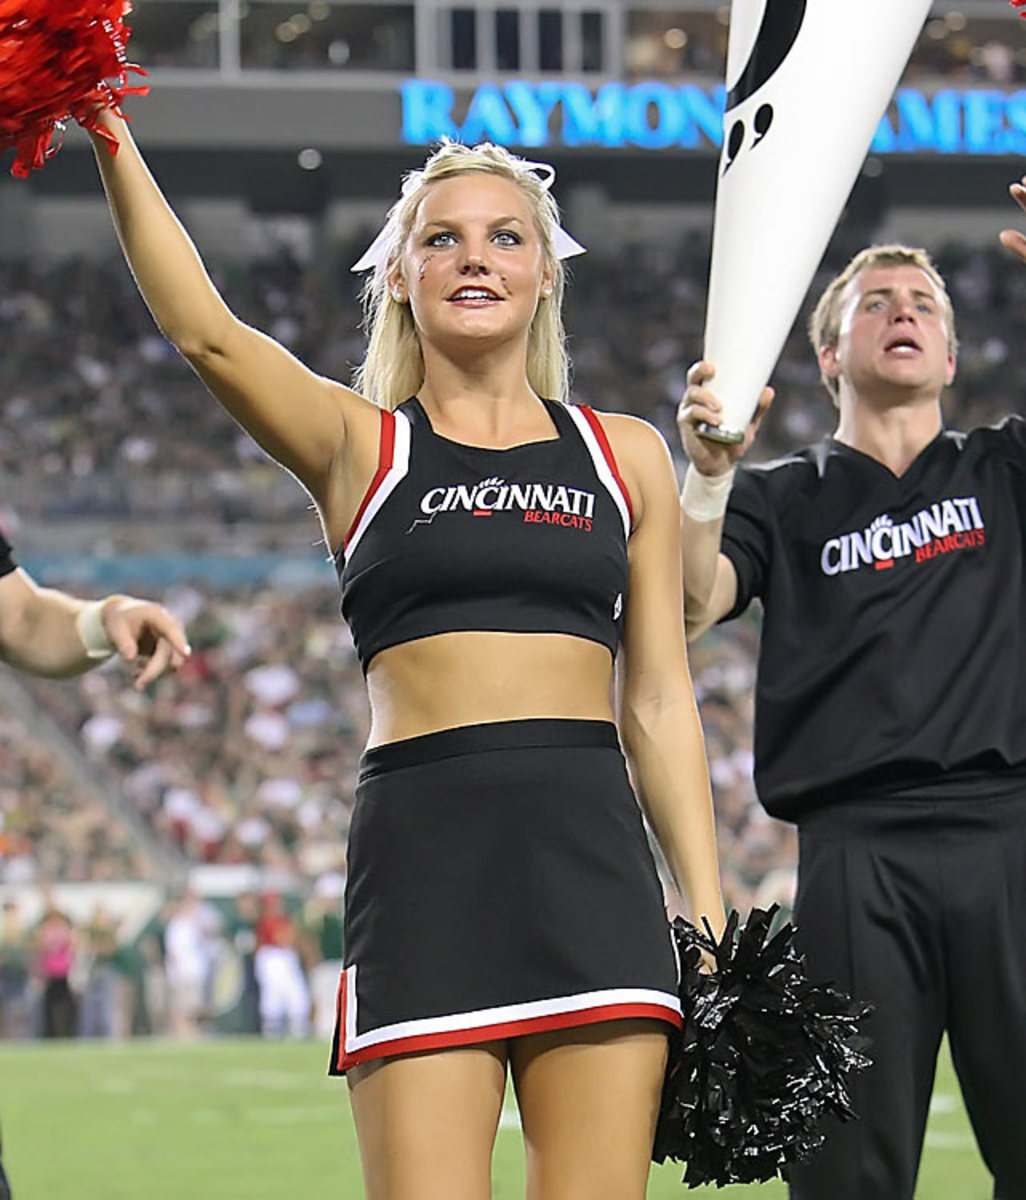 cheerleader.BRY_8697.jpg